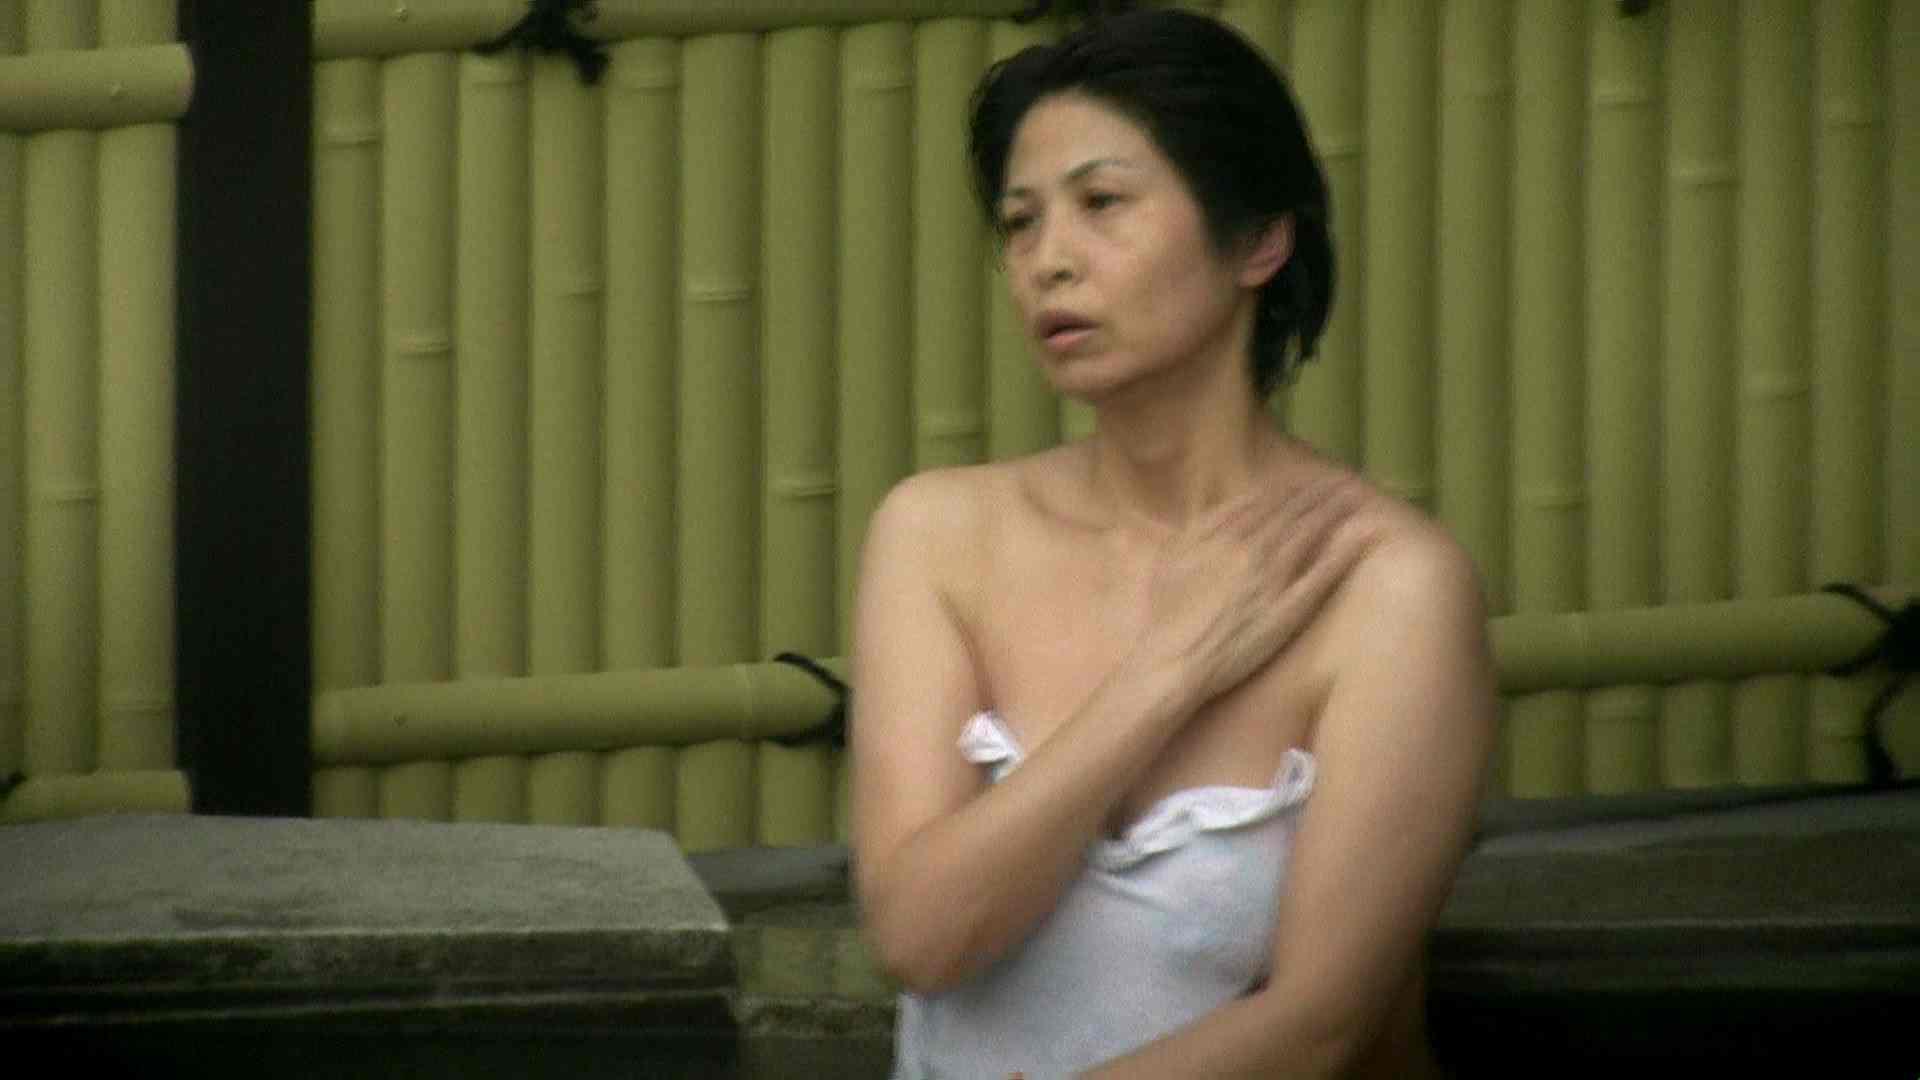 Aquaな露天風呂Vol.636 女体盗撮 盗み撮りSEX無修正画像 87連発 35